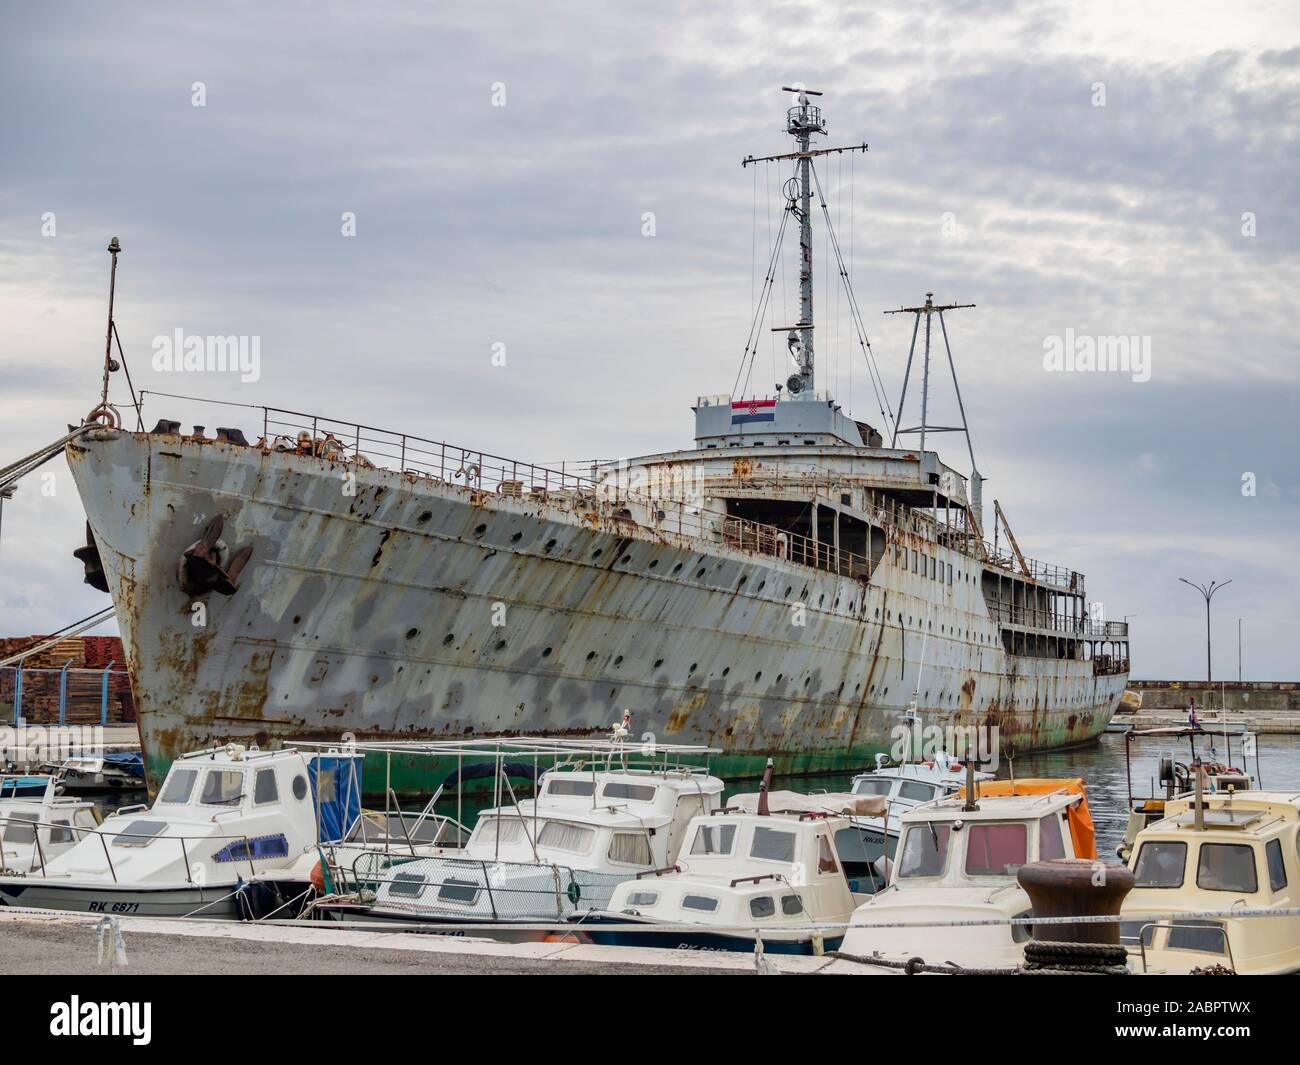 Ship Galeb in derelict state Rijeka Croatia ex president Josip Broz Tito's ship of Yugoslavian era Stock Photo